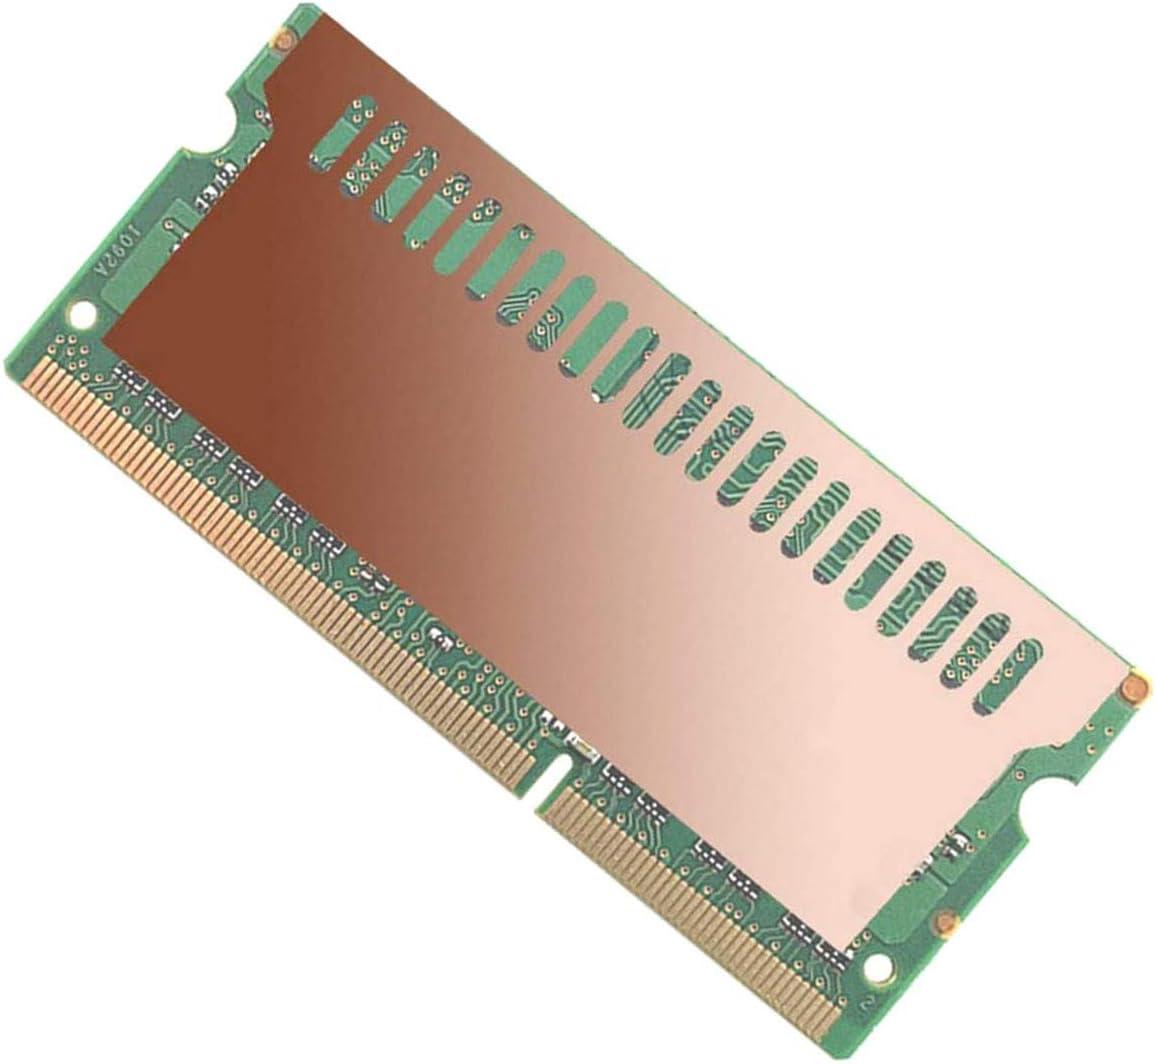 DGZZI Copper Heat Sink Cooler Heat Spreader Heatsink for Cooling Laptop Memory RAM